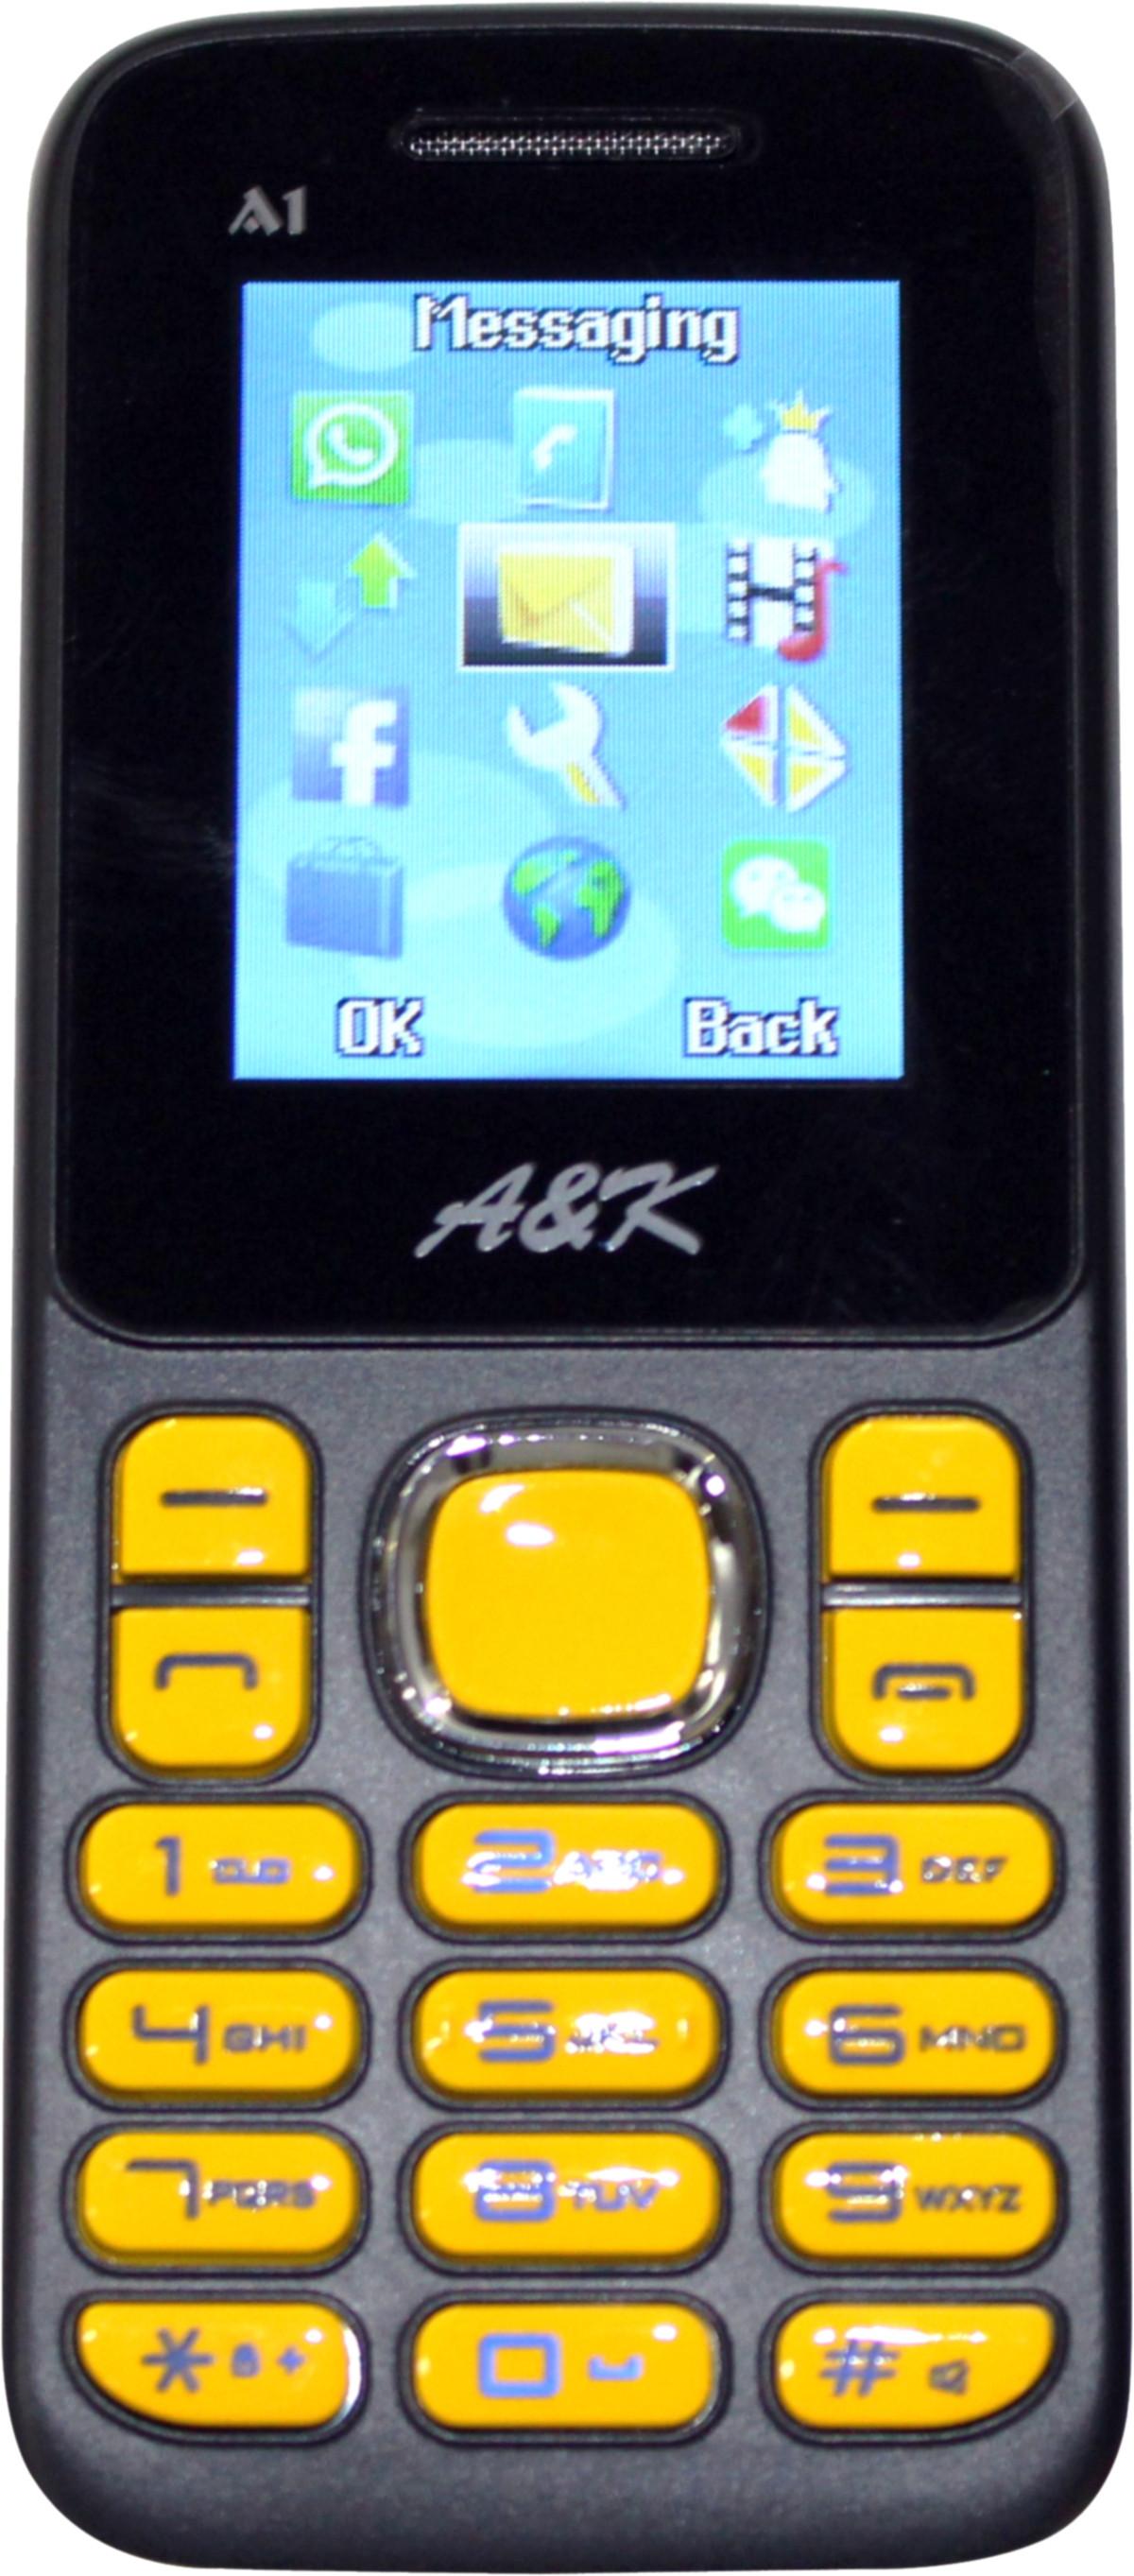 A & K Bar Phone A 1 Black, Yellow